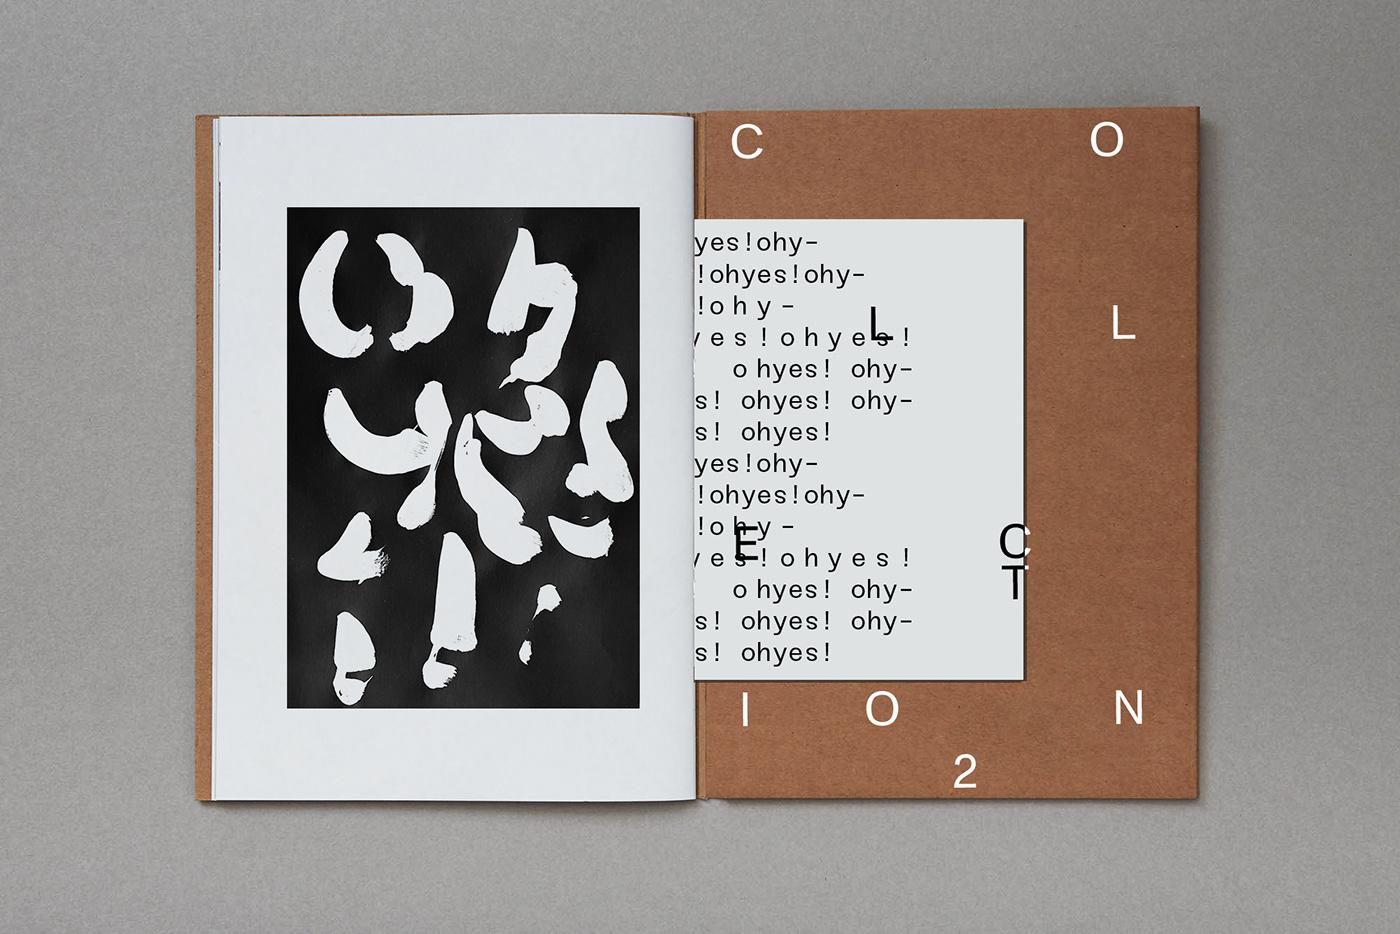 artist,brand,clean,Corporate Design,font,identity,lettering,Studio fabio biesel,Style,typography